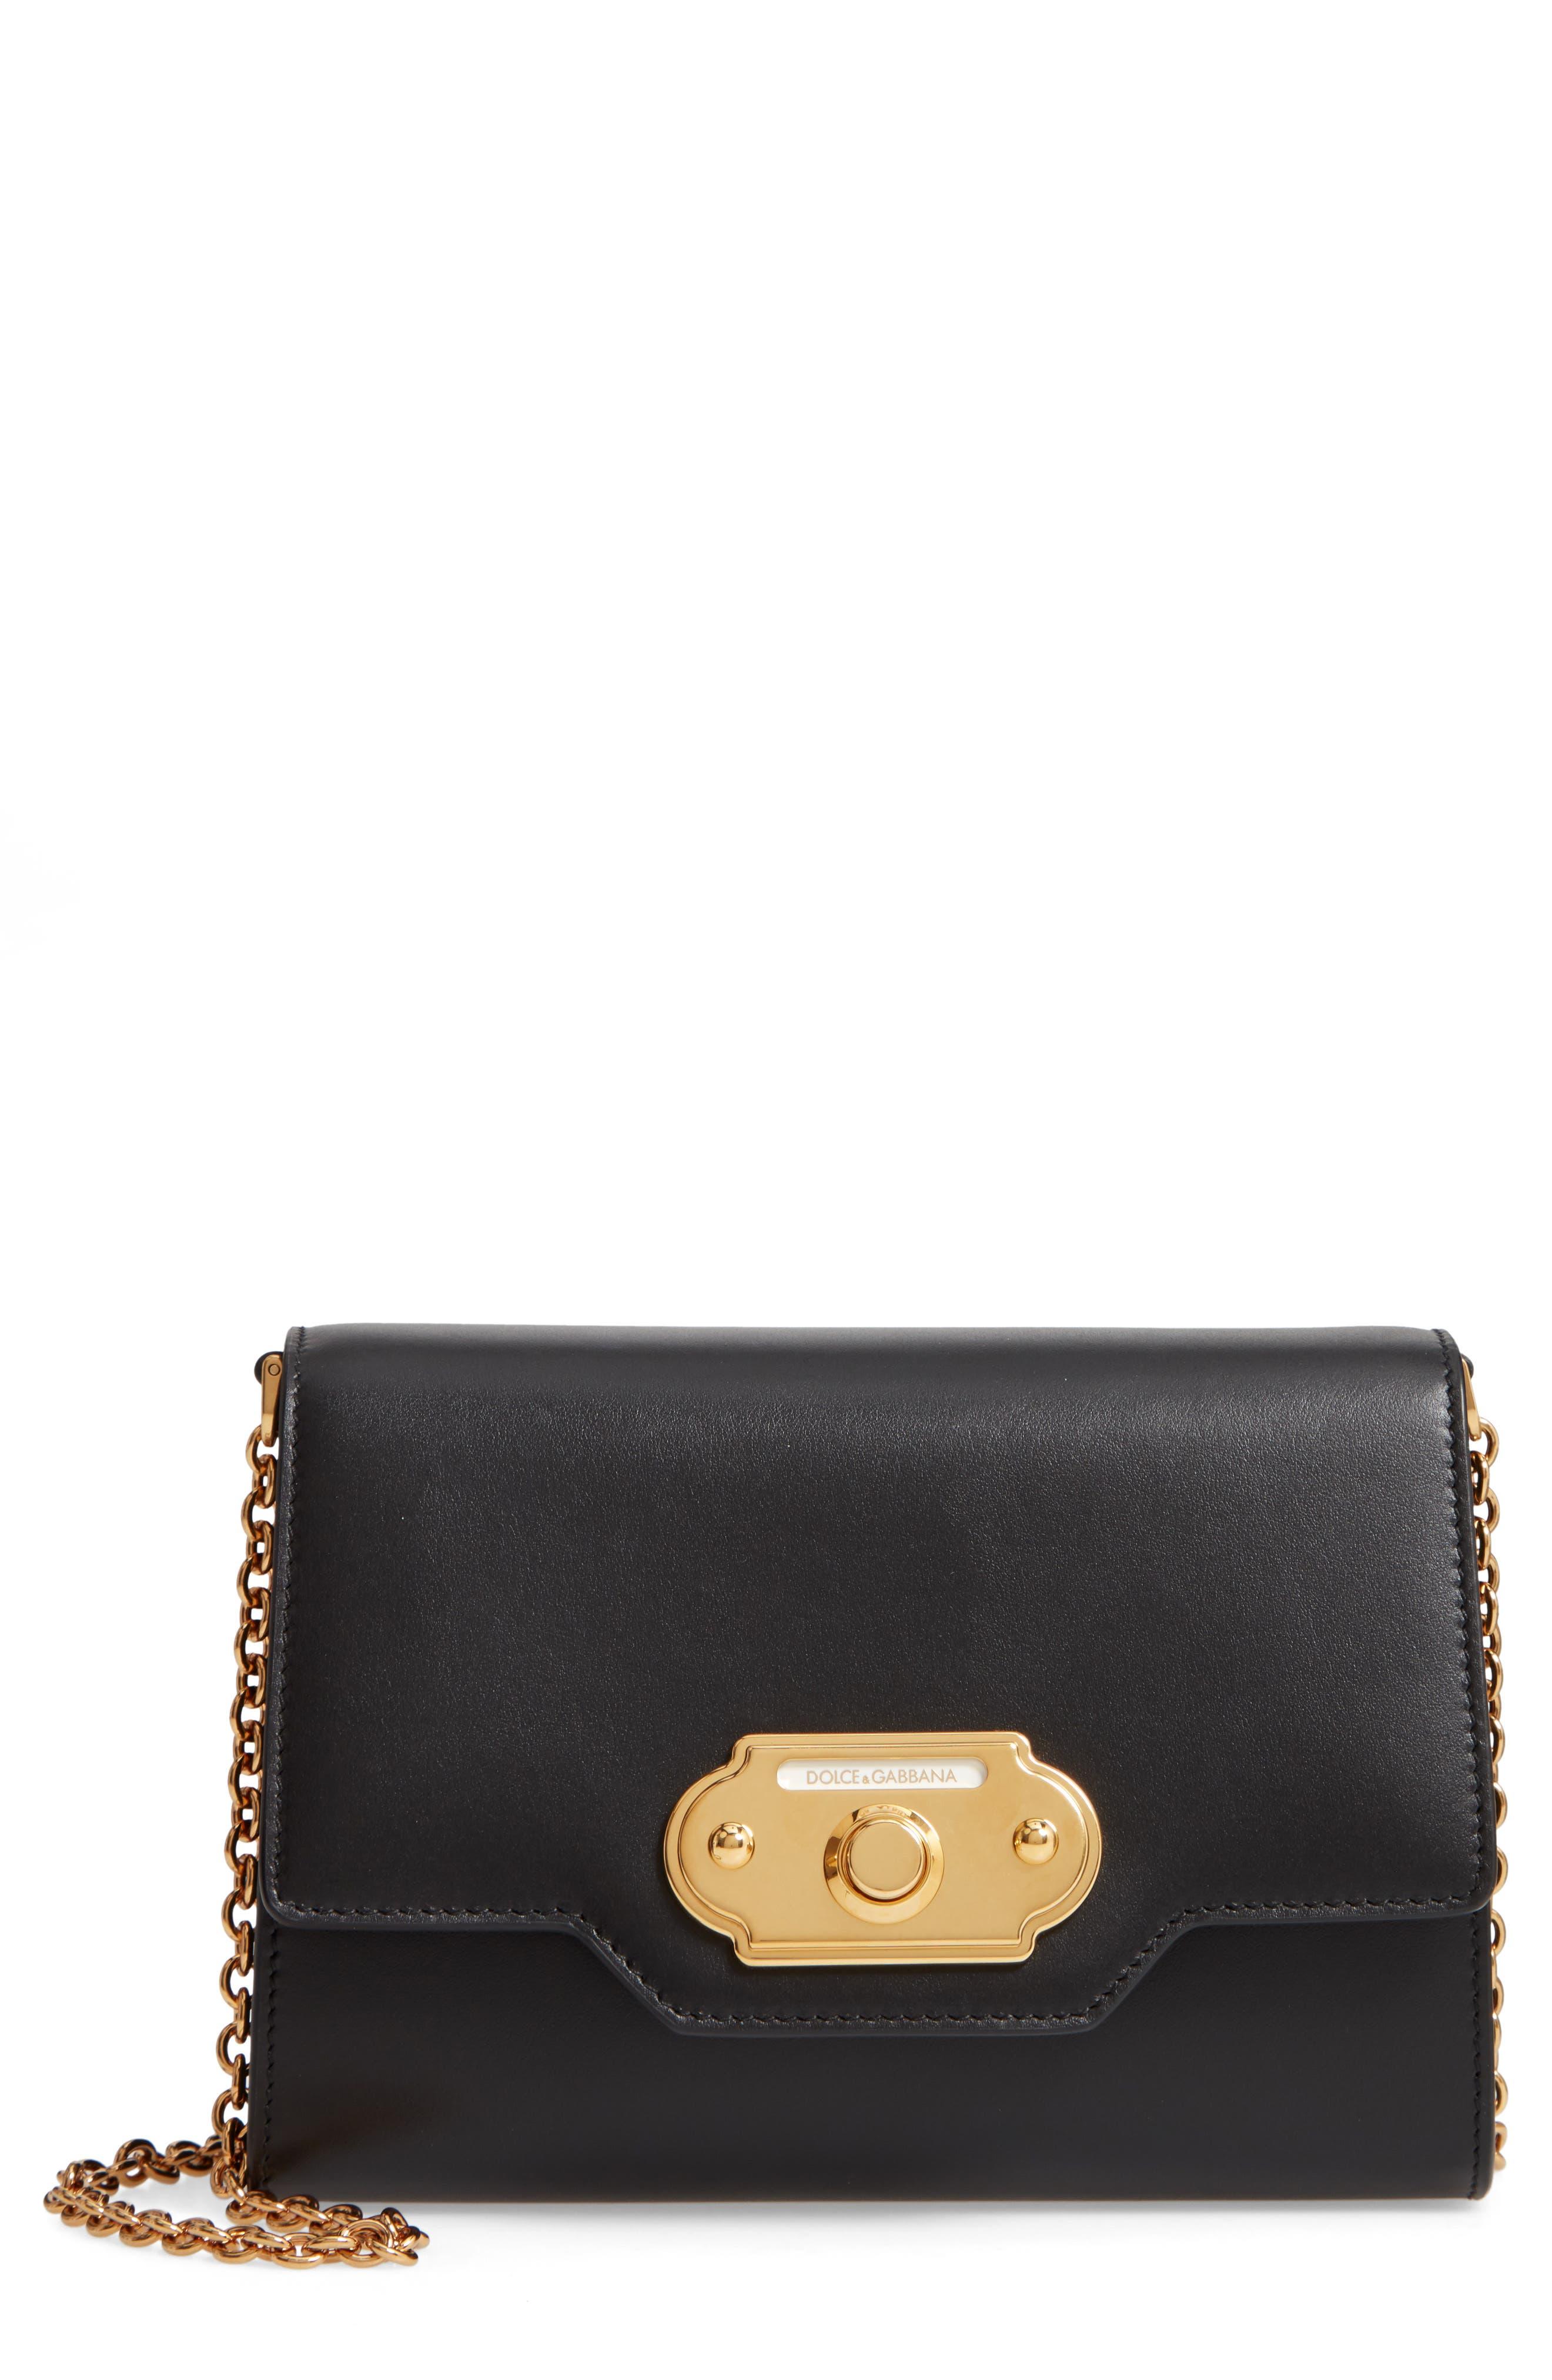 Women s Dolce Gabbana Designer Handbags   Wallets  896143b7bb3cd